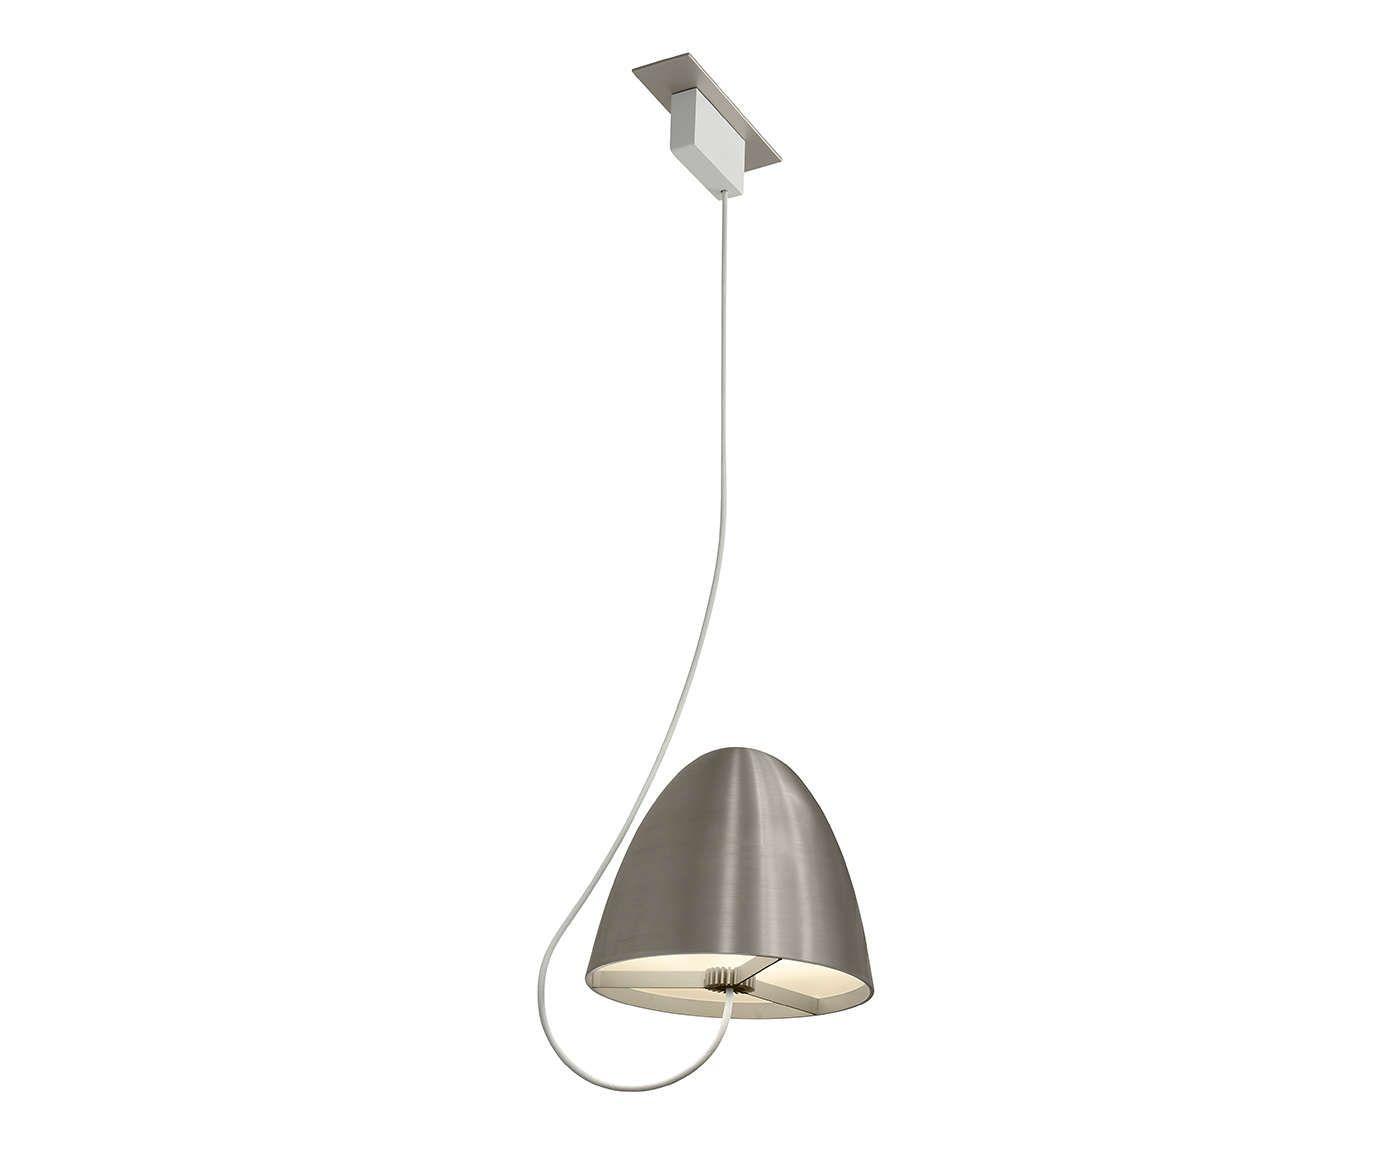 Pendente wet bell - la lampe | Westwing.com.br